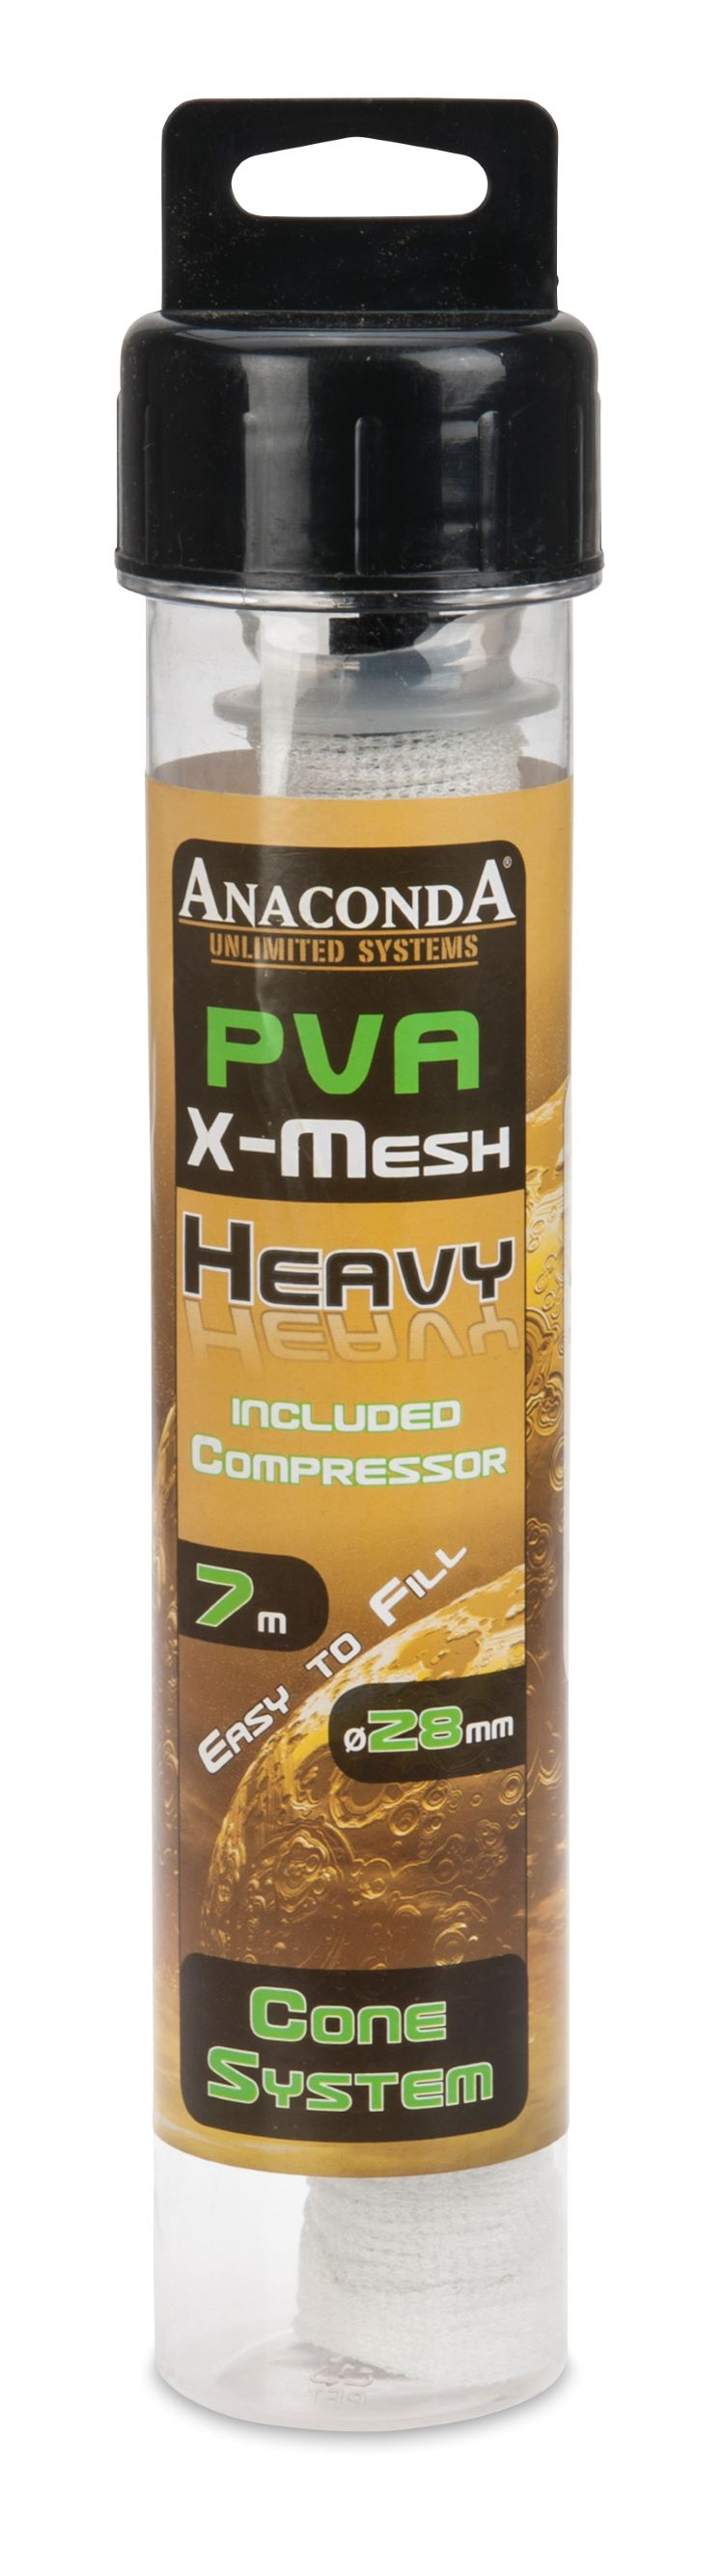 PVA Anaconda PVA X-Mesh 28 mm